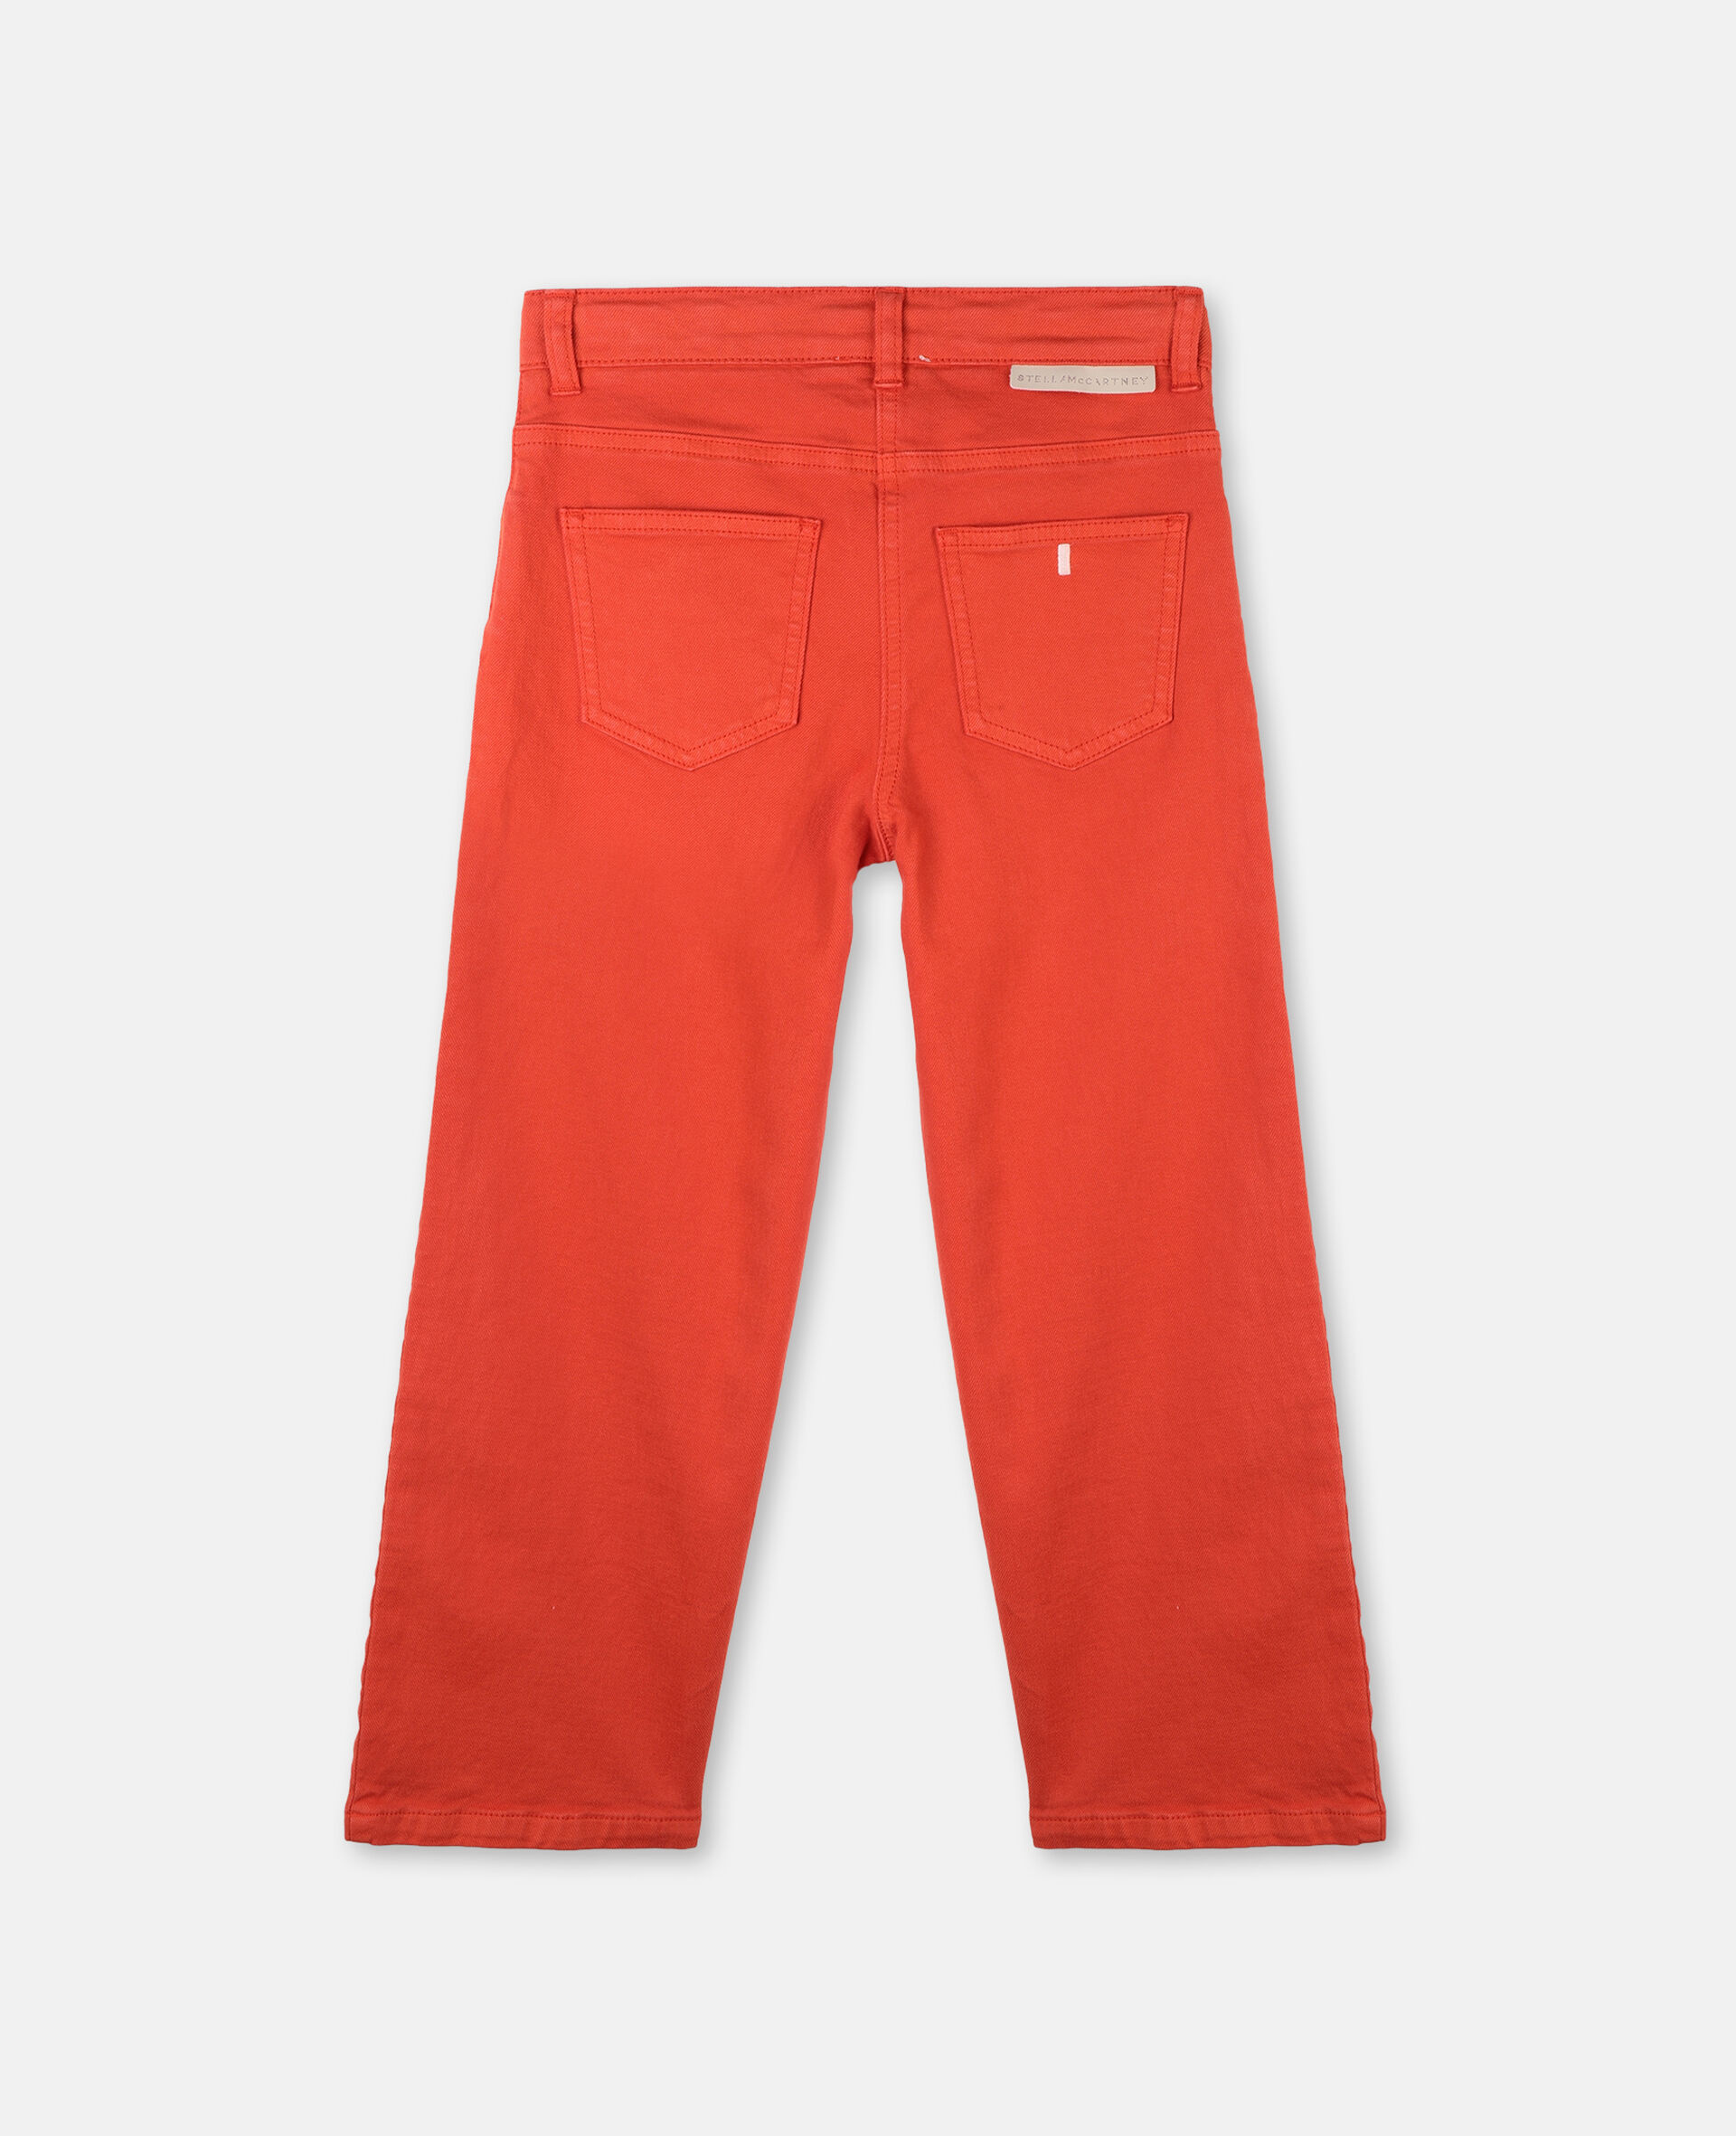 Cotton Denim Pants-Red-large image number 3